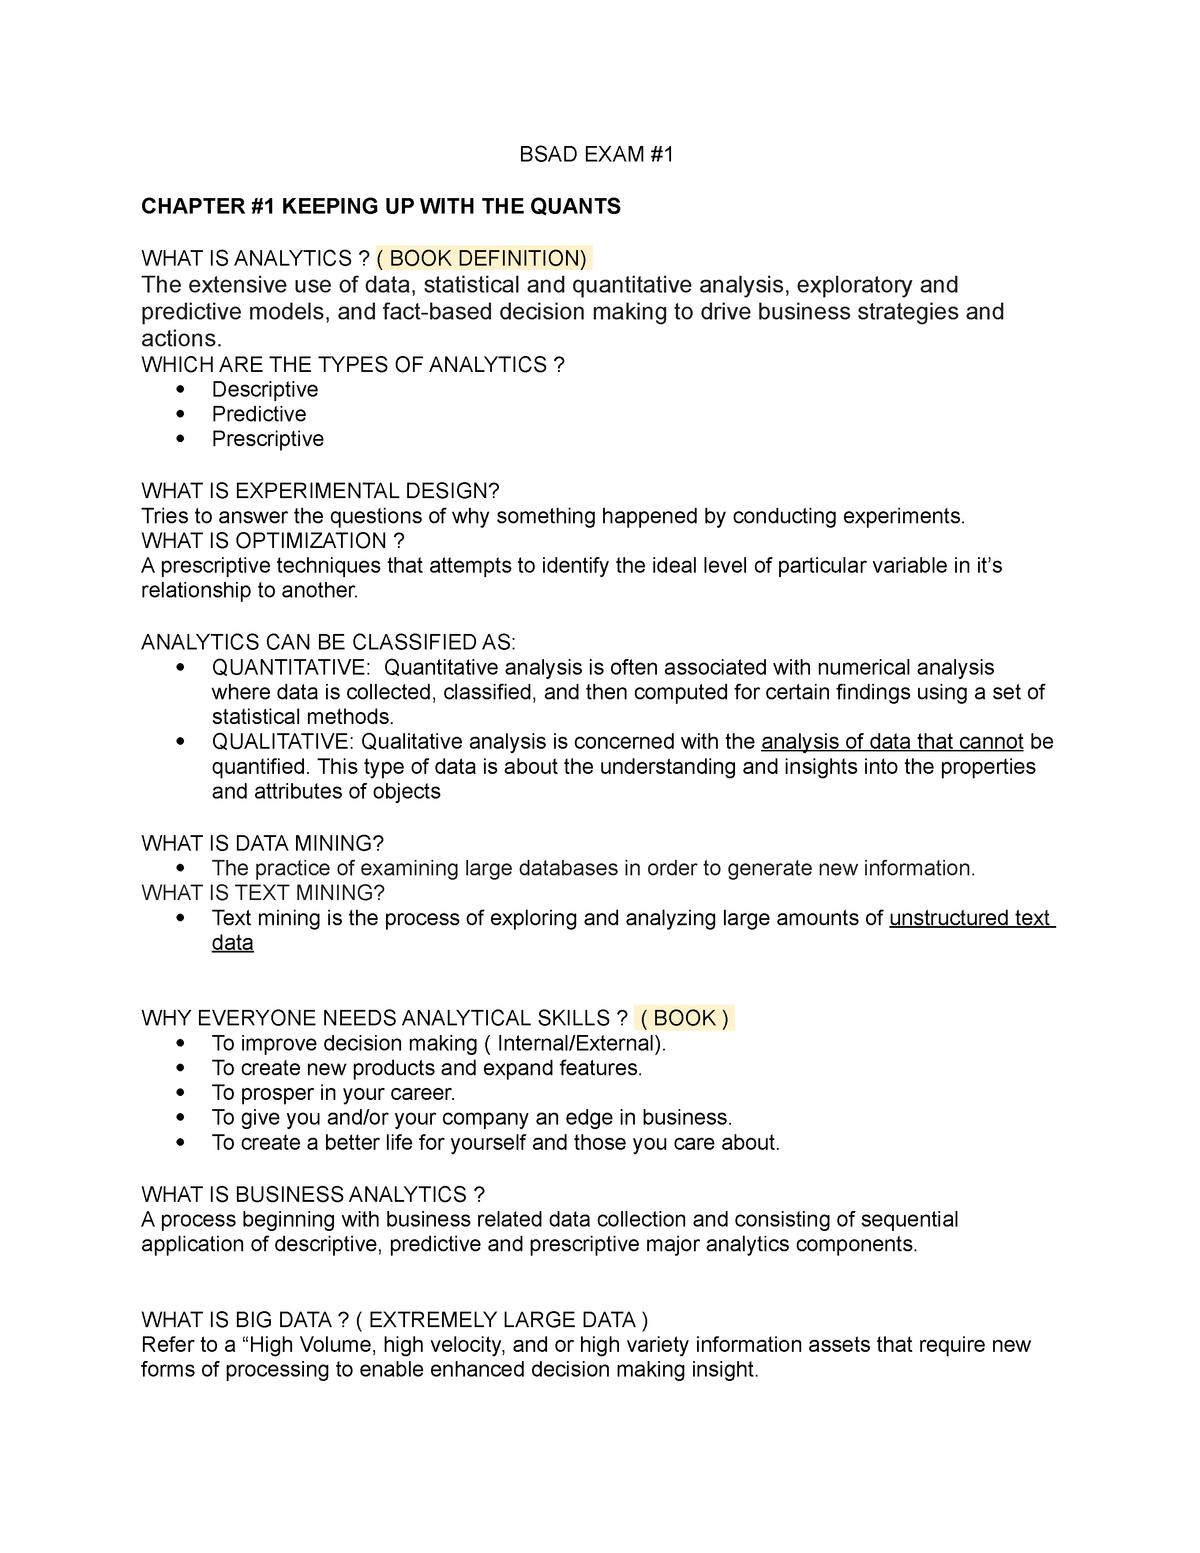 iiba entry certificate in business analysis (ecba)